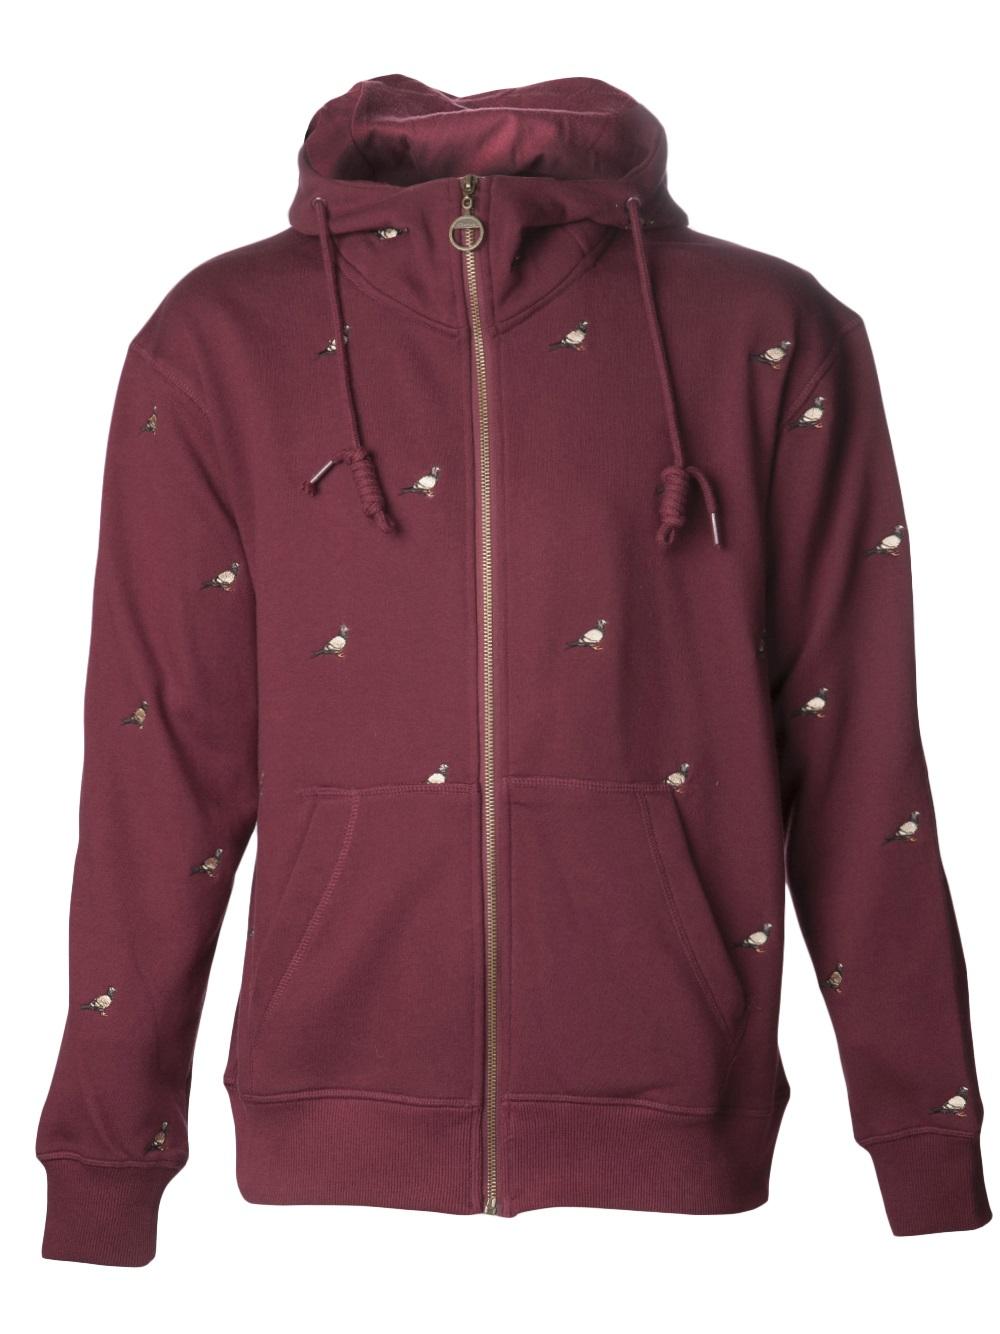 staple sydney hoodie in for lyst